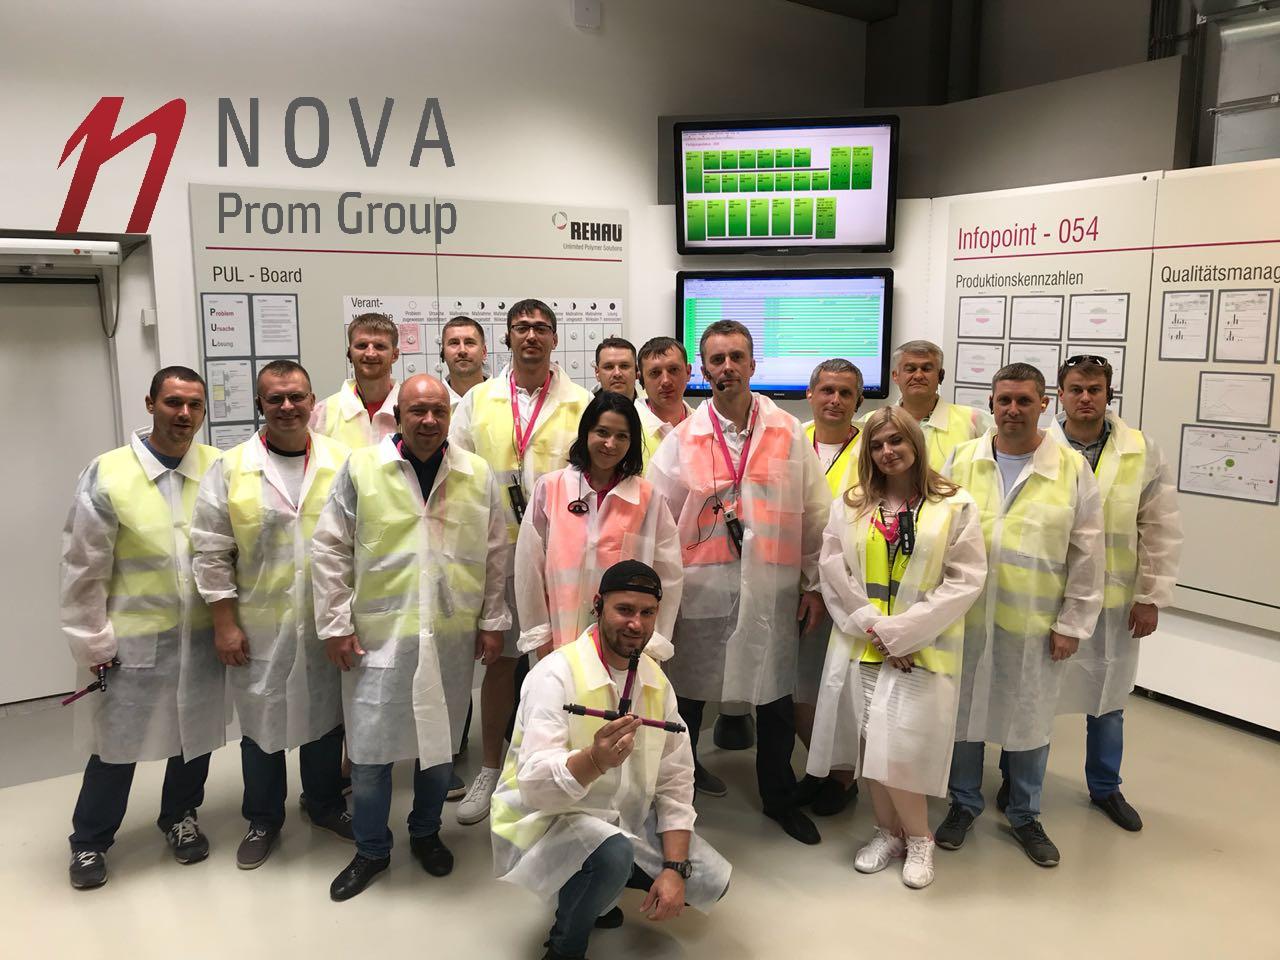 NOVA Prom Group на заводе Rehau